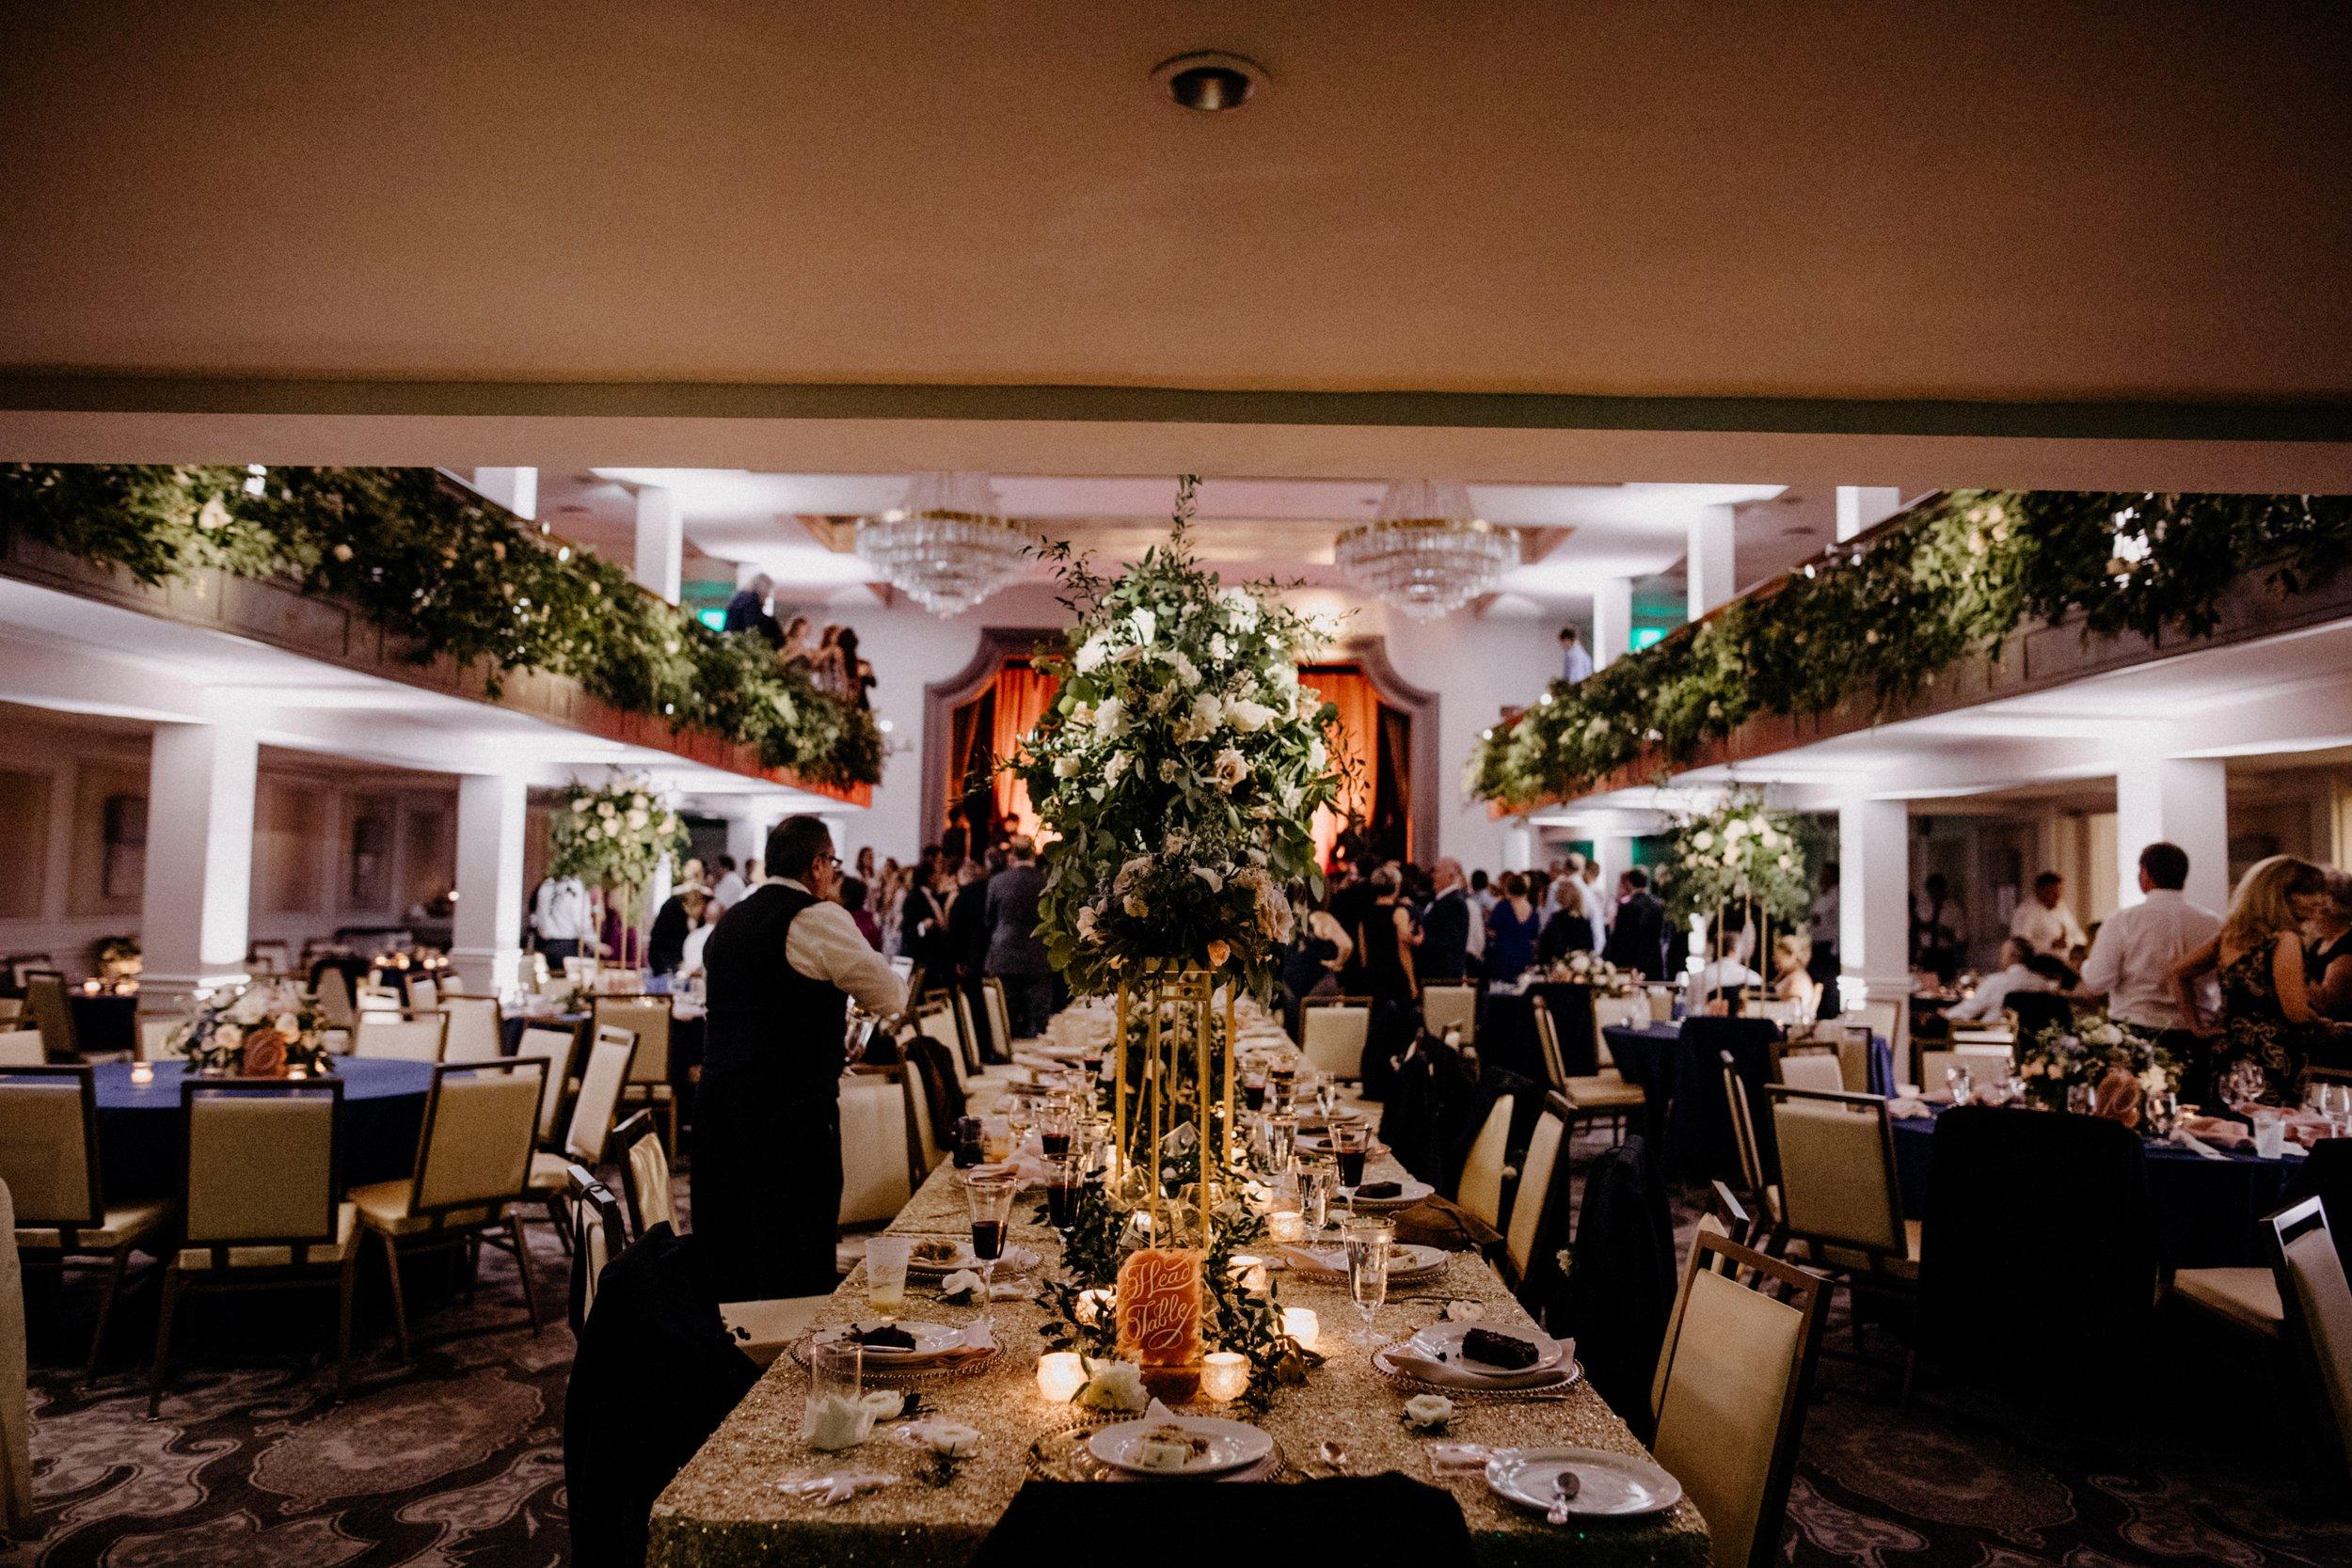 st-anthony-hotel-wedding-photography-10189san-antonio.JPG